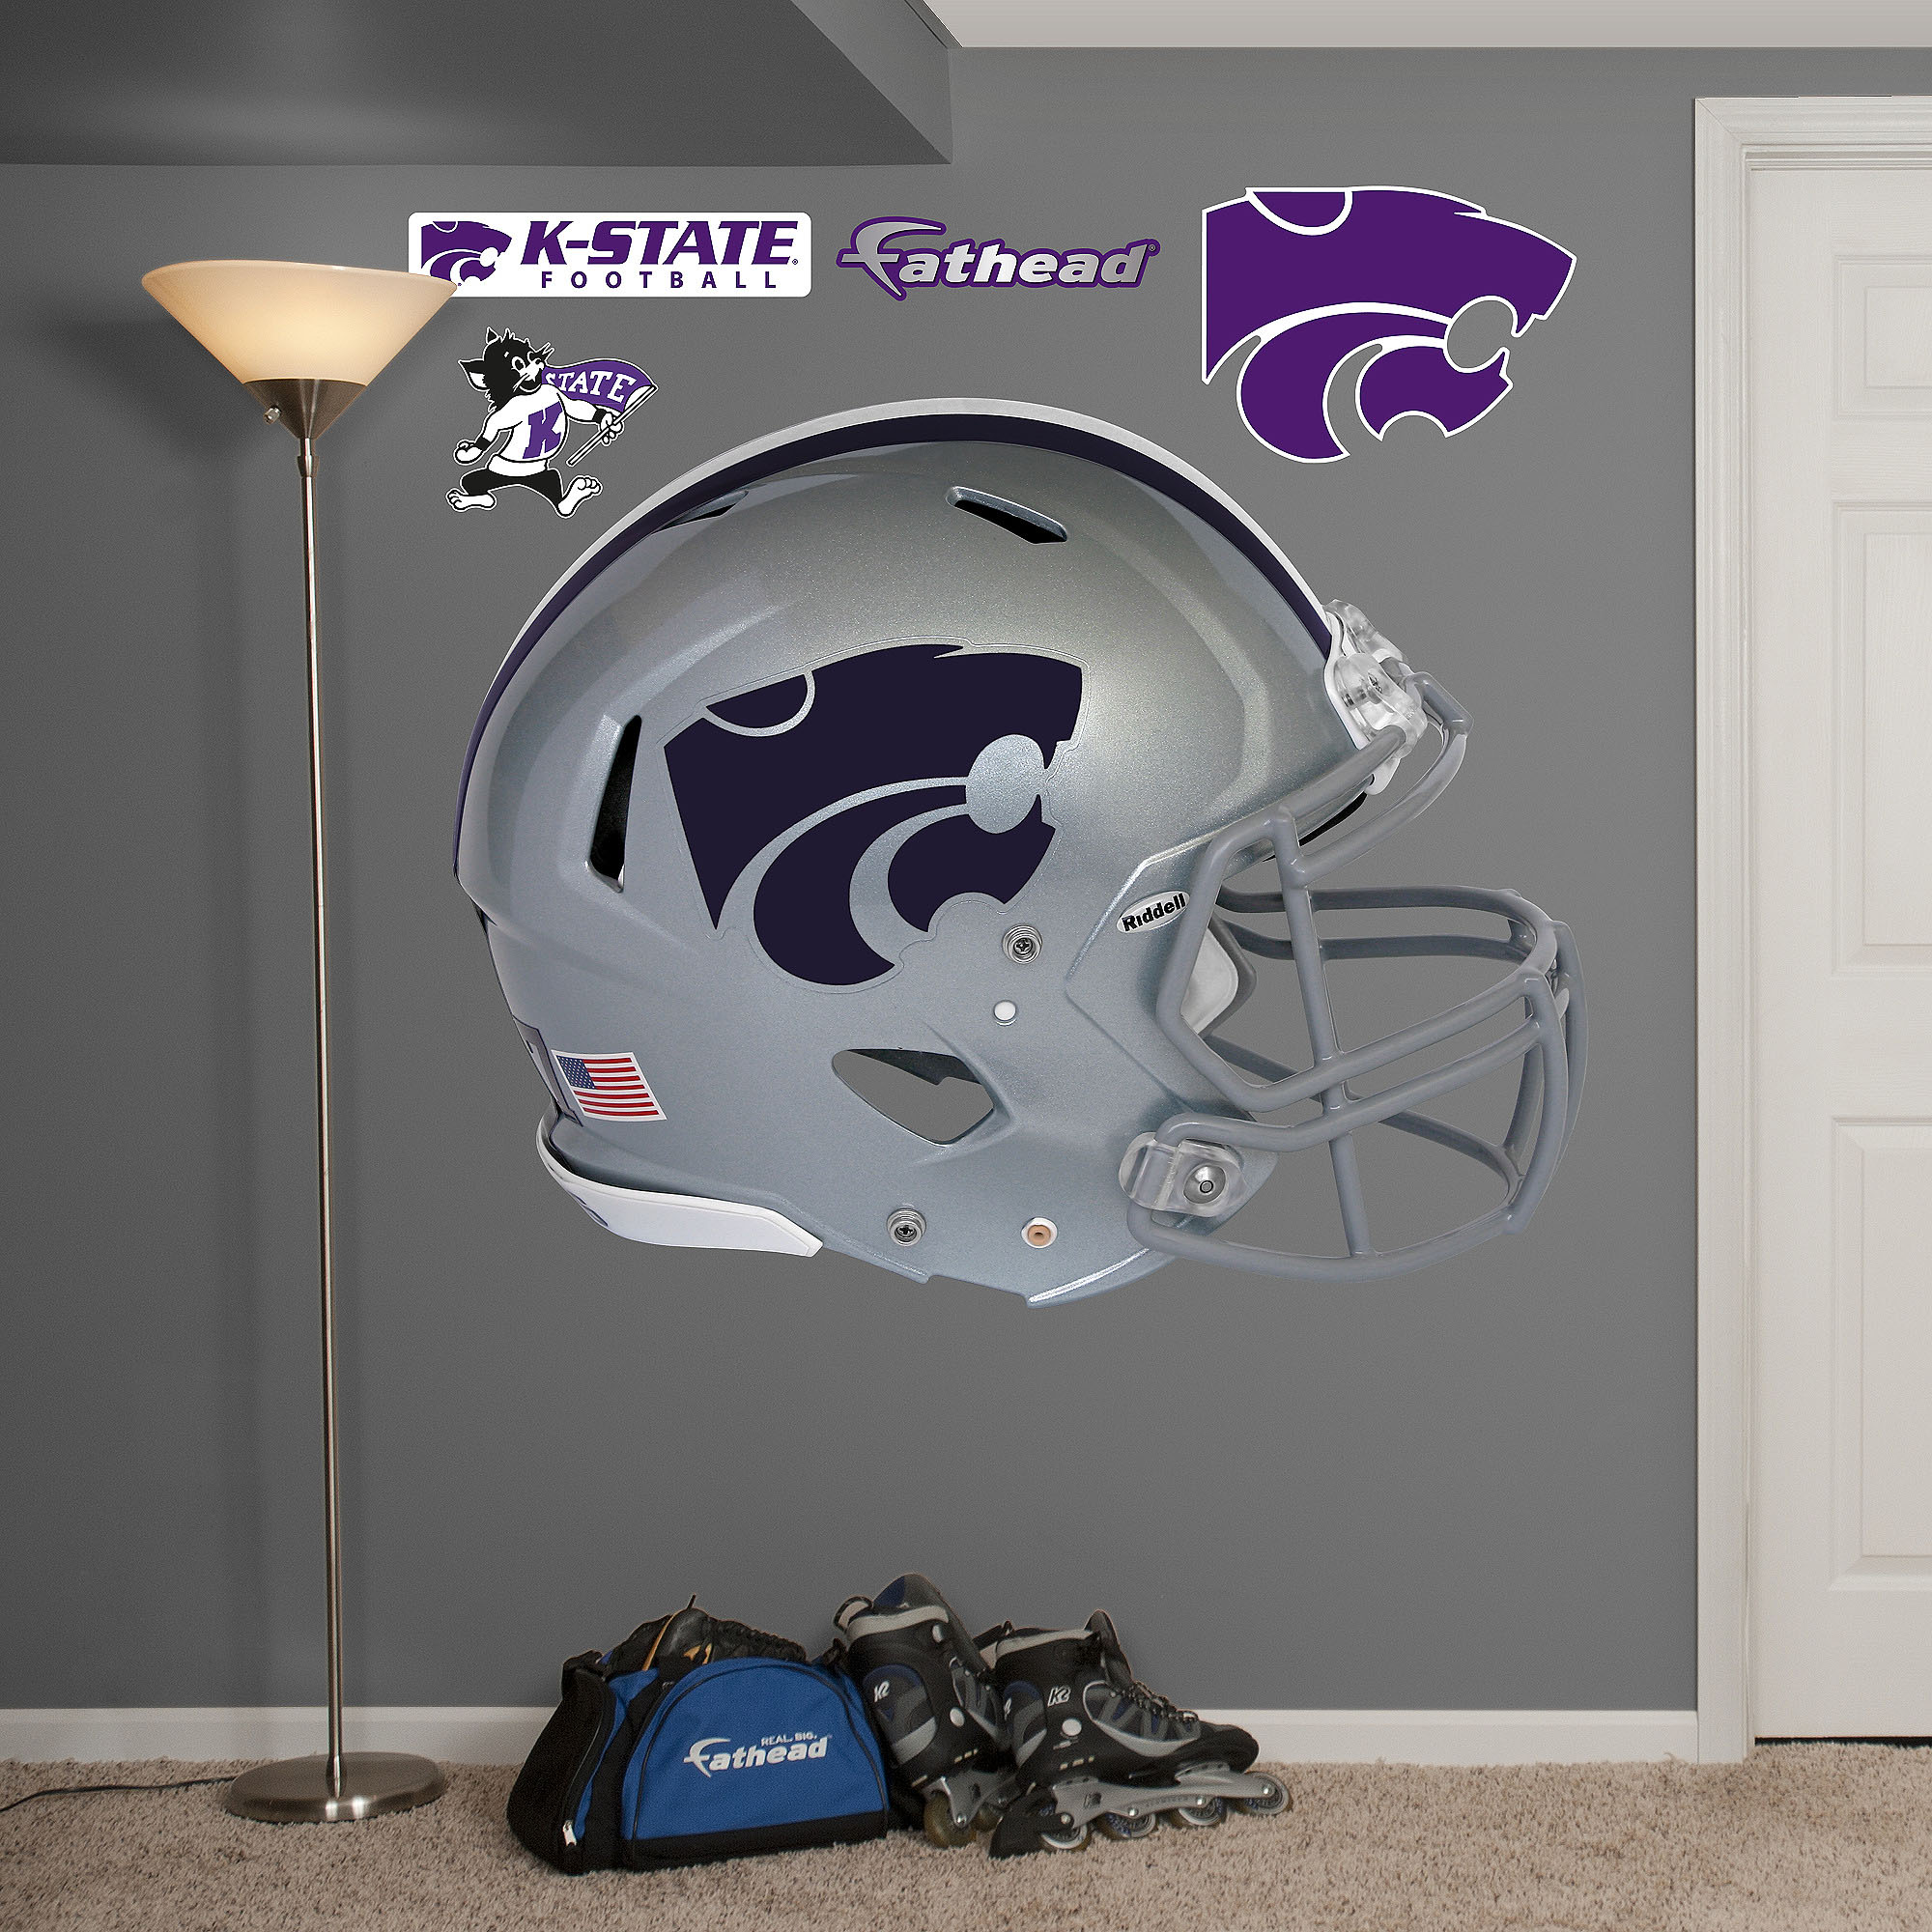 Kansas State Helmet